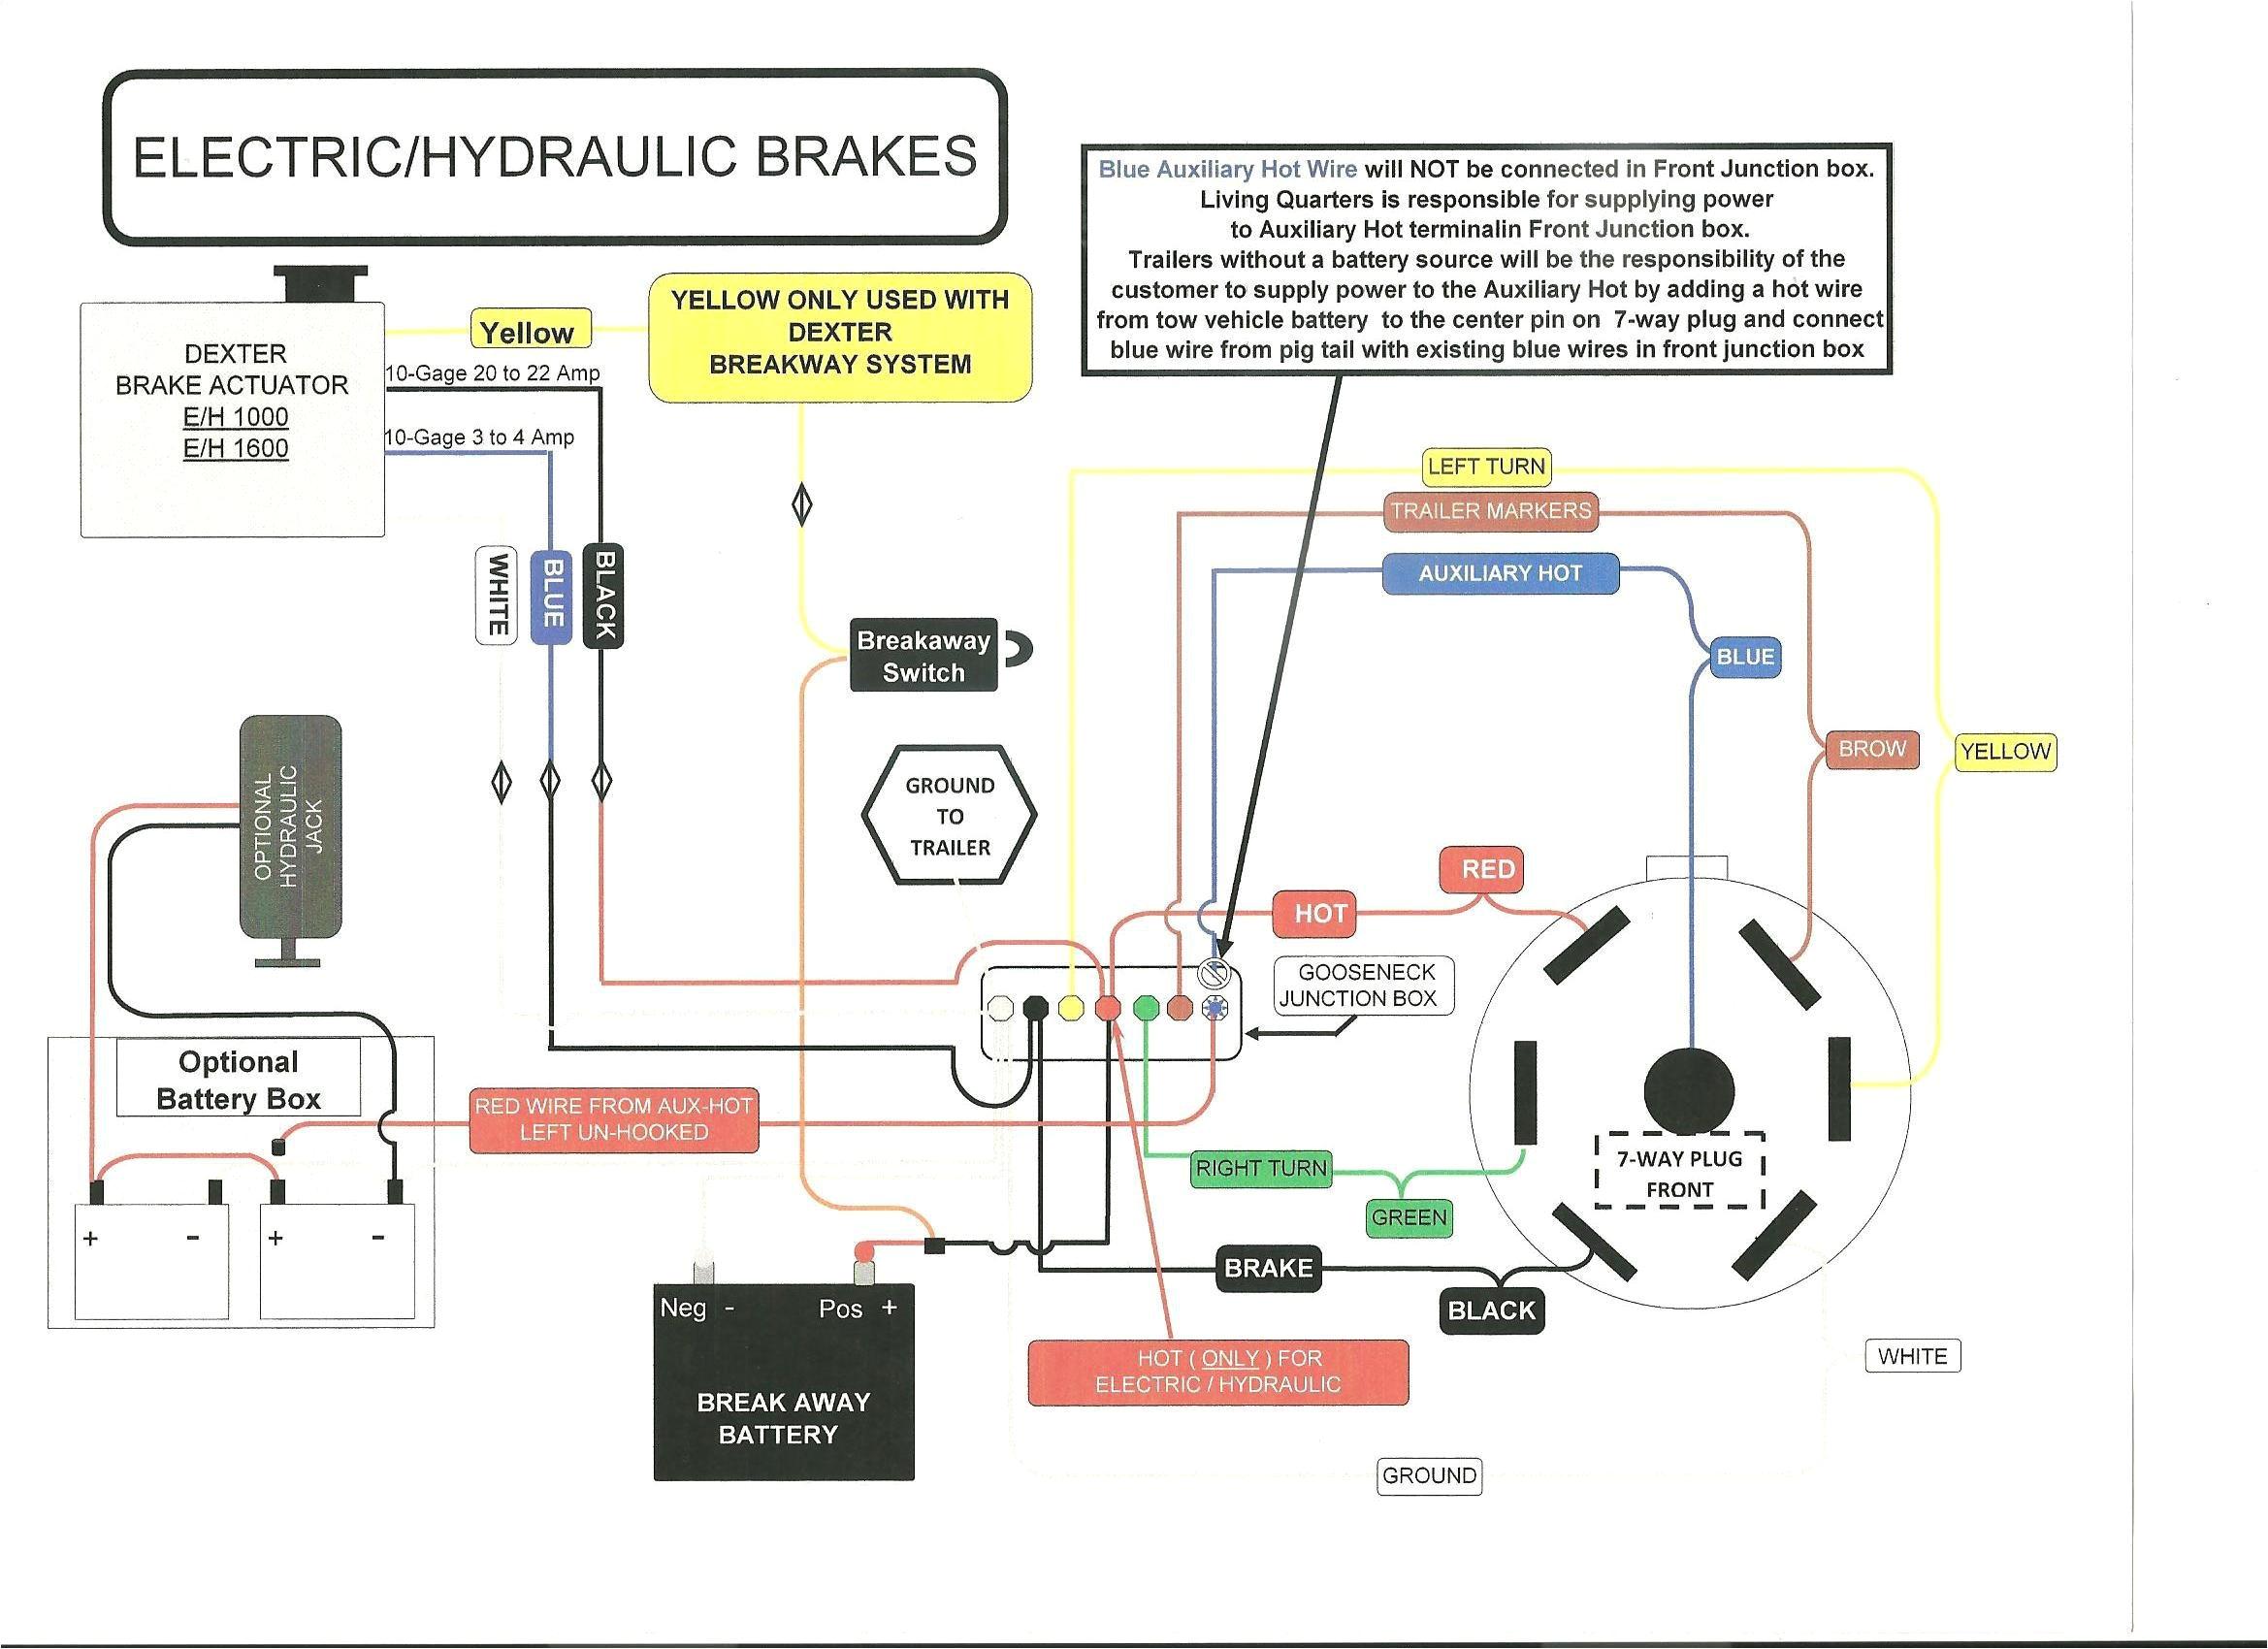 wiring diagram car trailer electric kes free download wiring data trailer kes wiring diagram wiring diagram